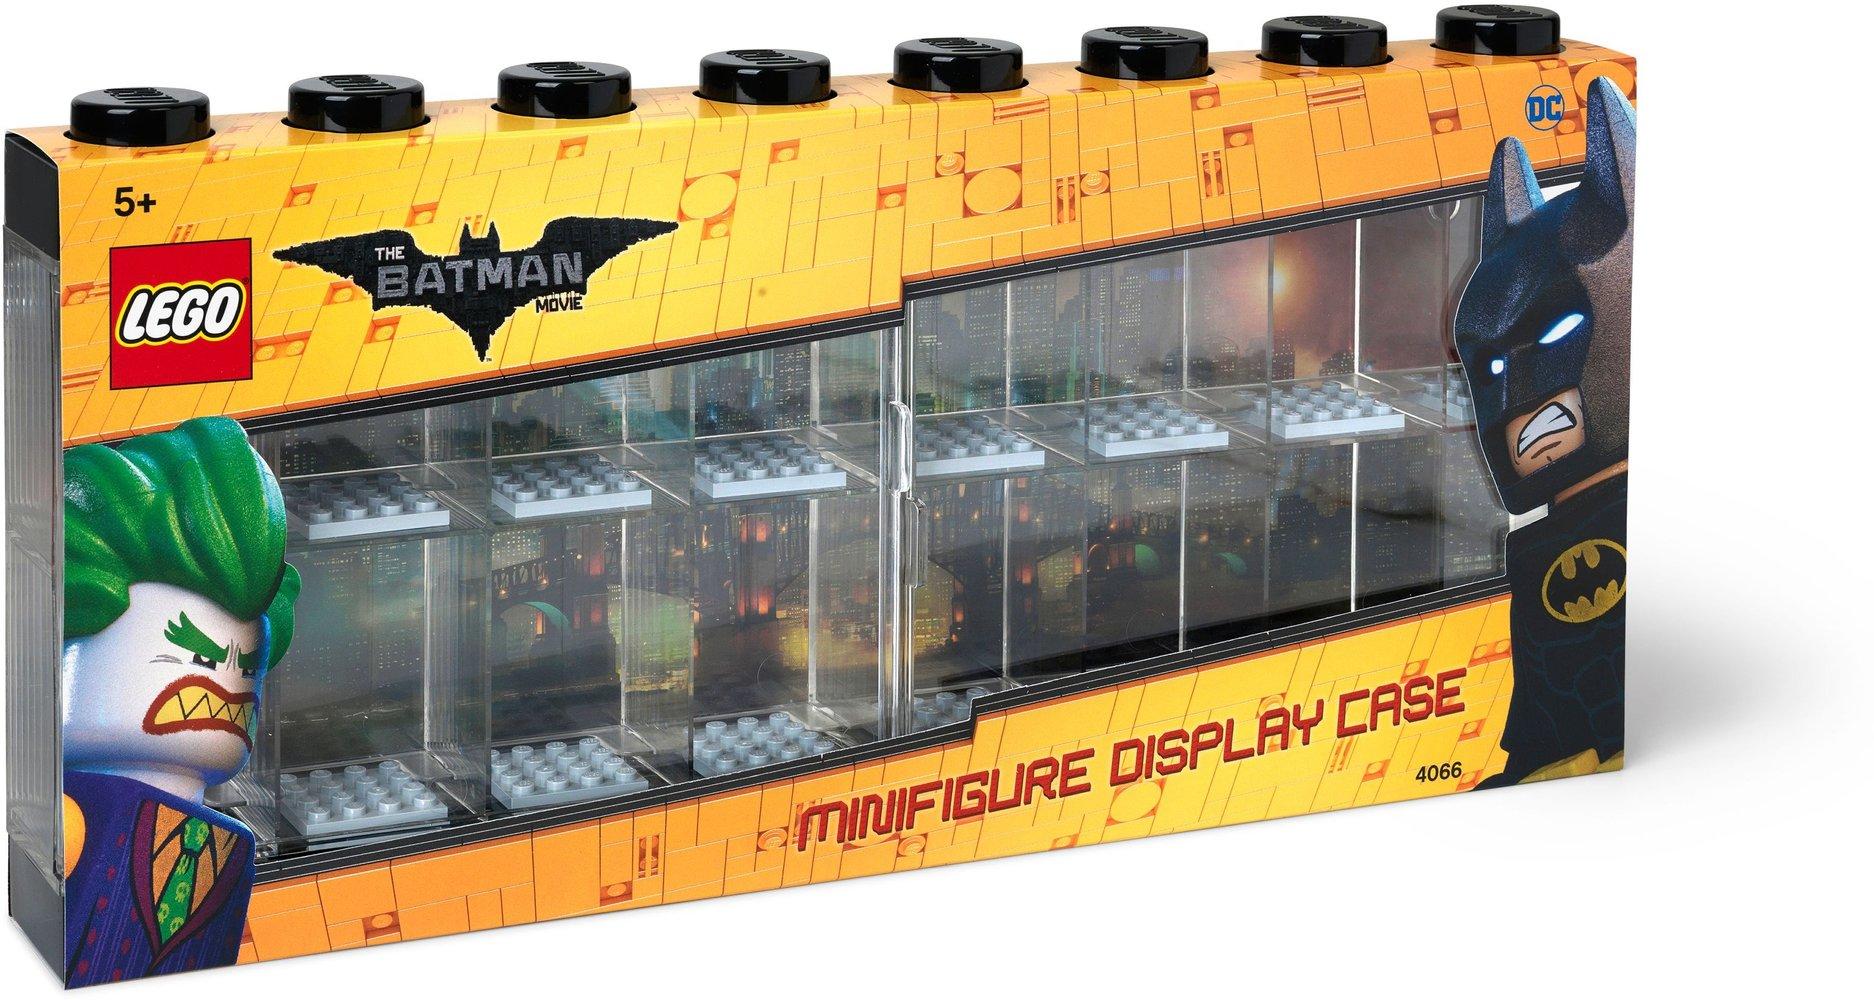 Minifigure Display Case (The LEGO Batman Movie)